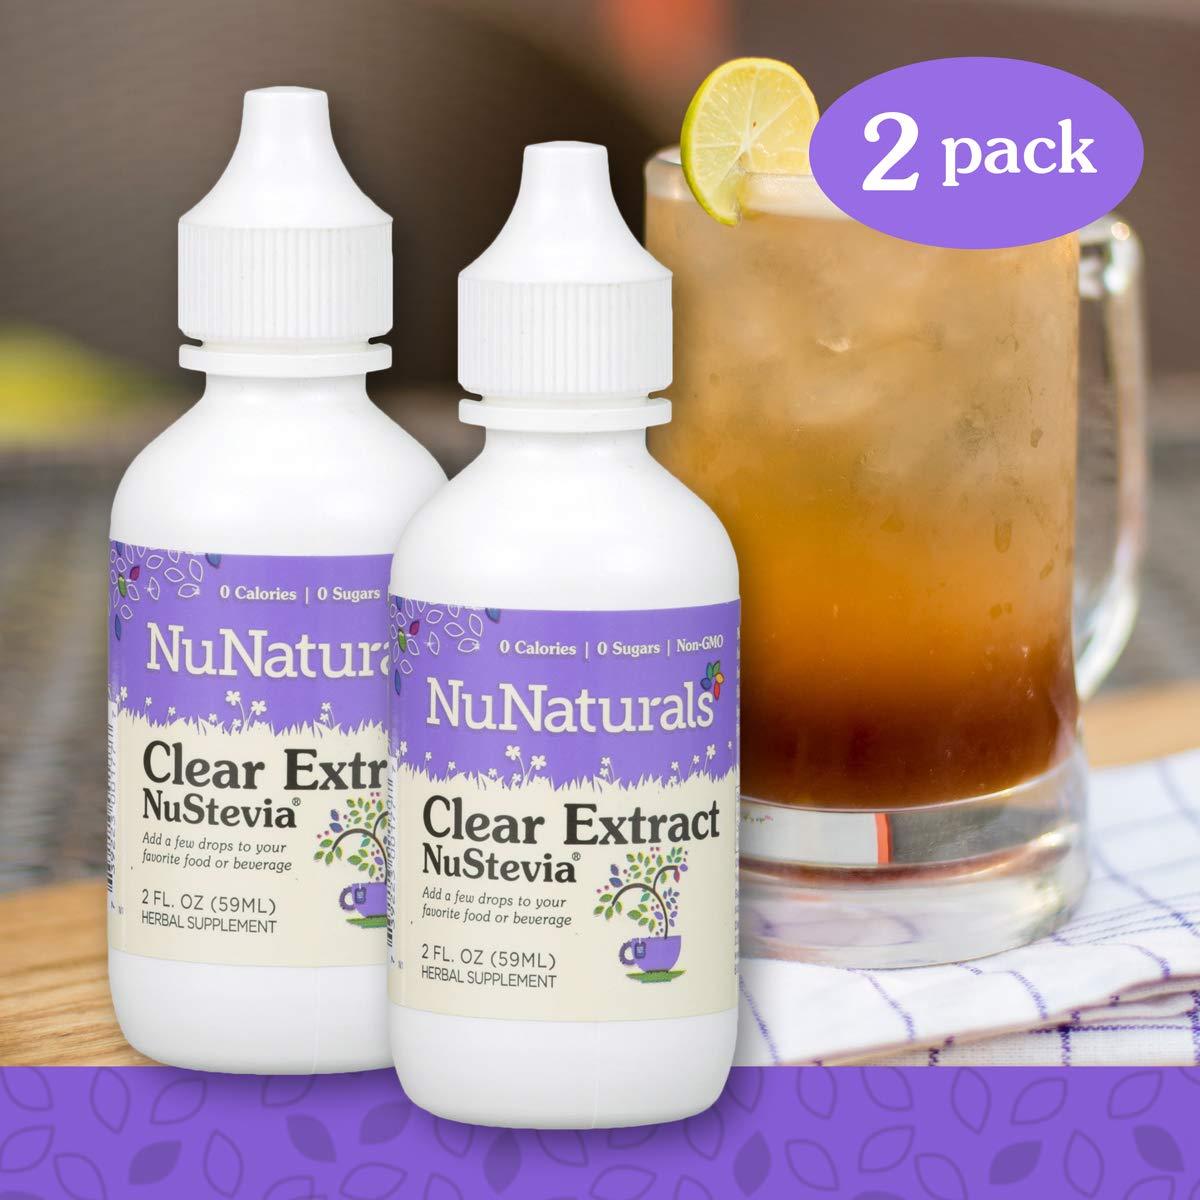 NuNaturals NuStevia Clear Extract Stevia Natural Liquid Sweetener, Sugar-Free (2 oz, 2 Pack) by NuNaturals